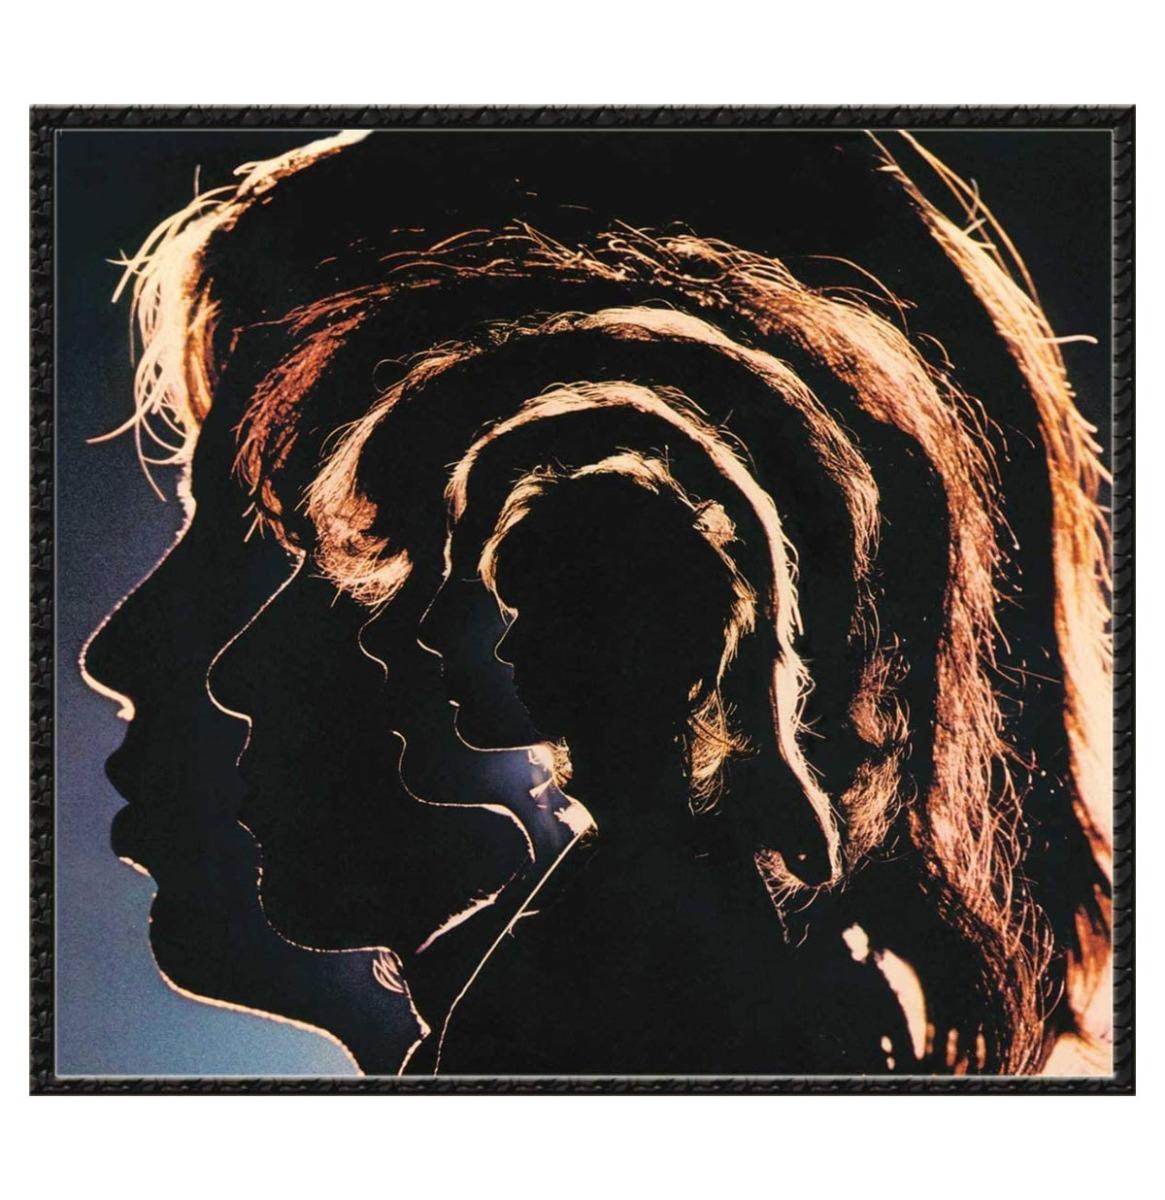 The Rolling Stones - Hot Rocks 1964 - 1971 2-LP